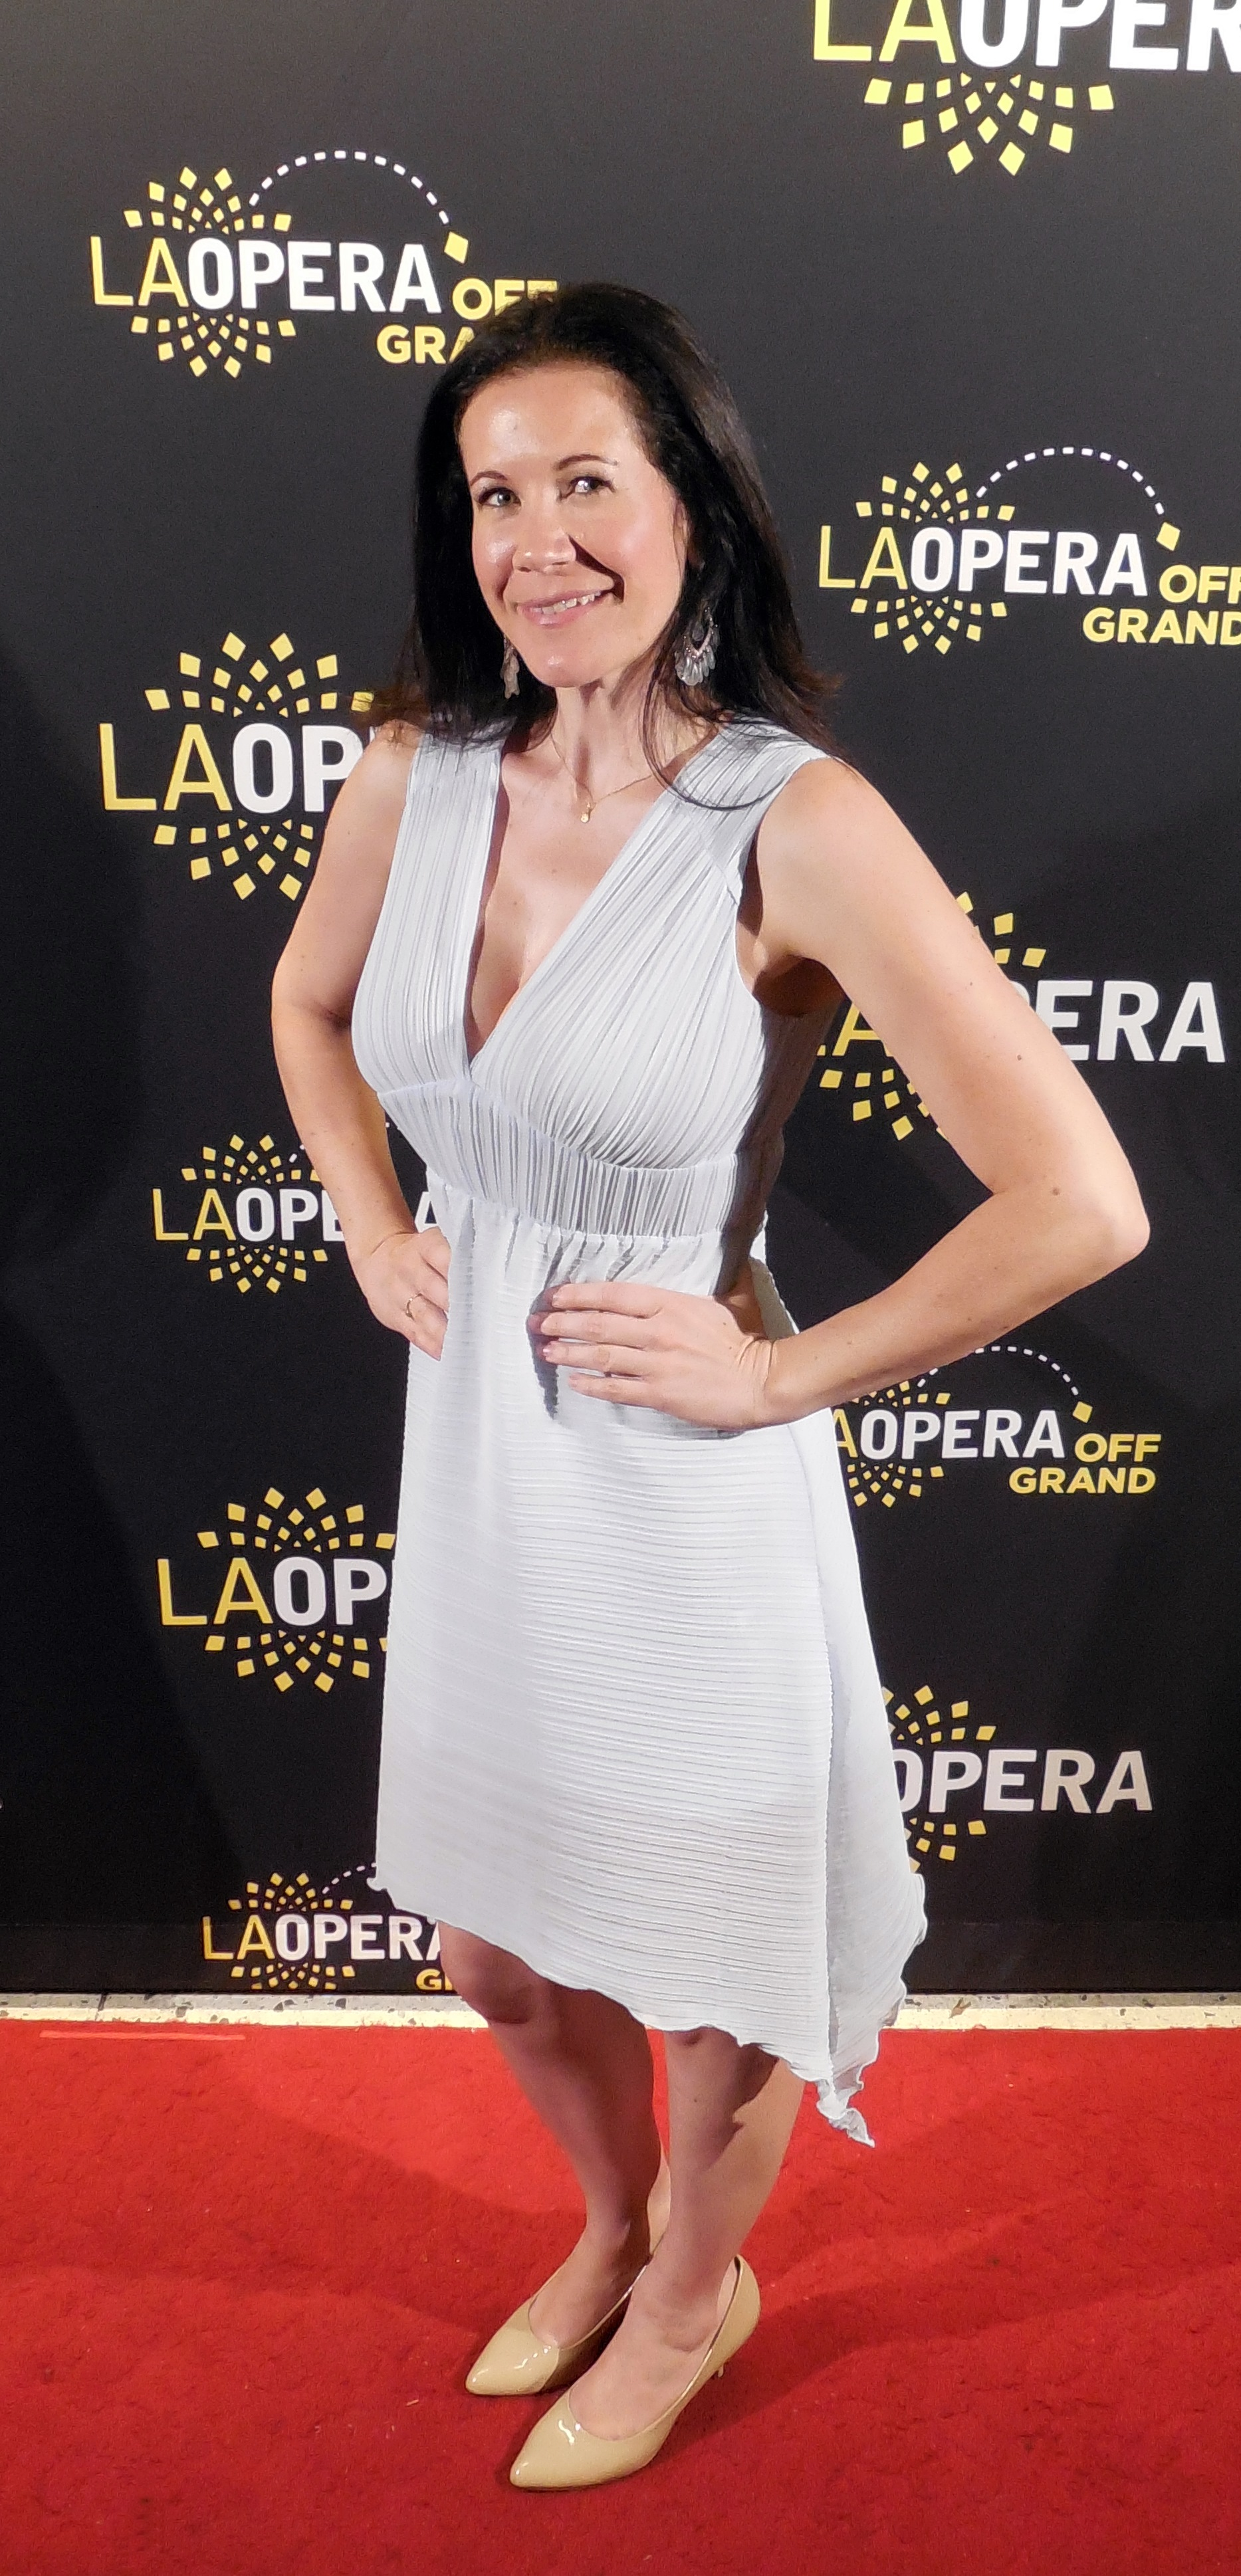 La Opera Red Carpet